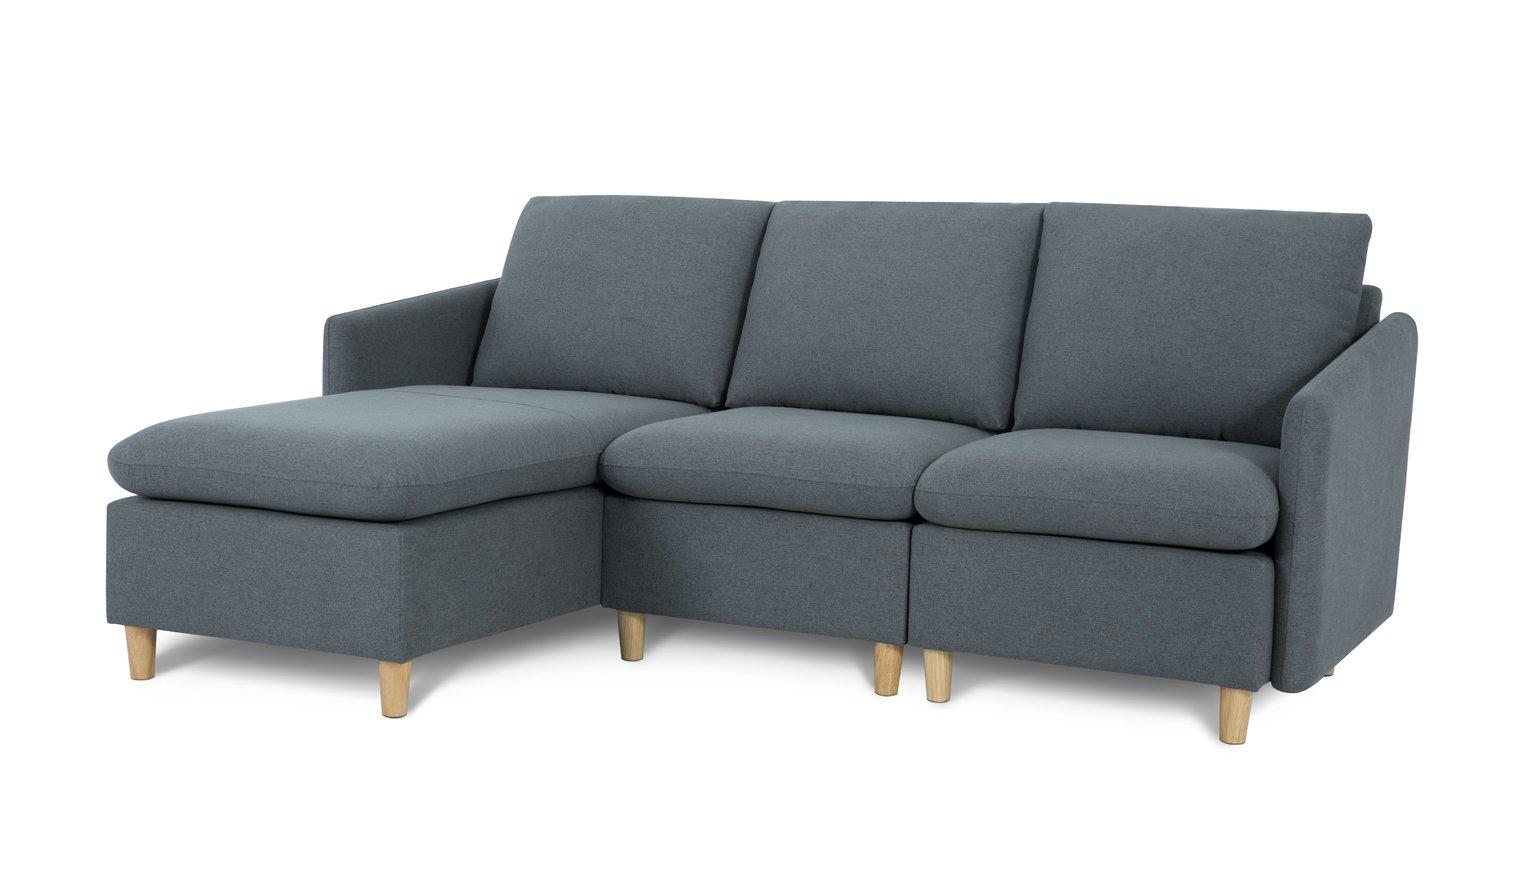 Habitat Mod Reversible Corner Fabric Sofa - Grey